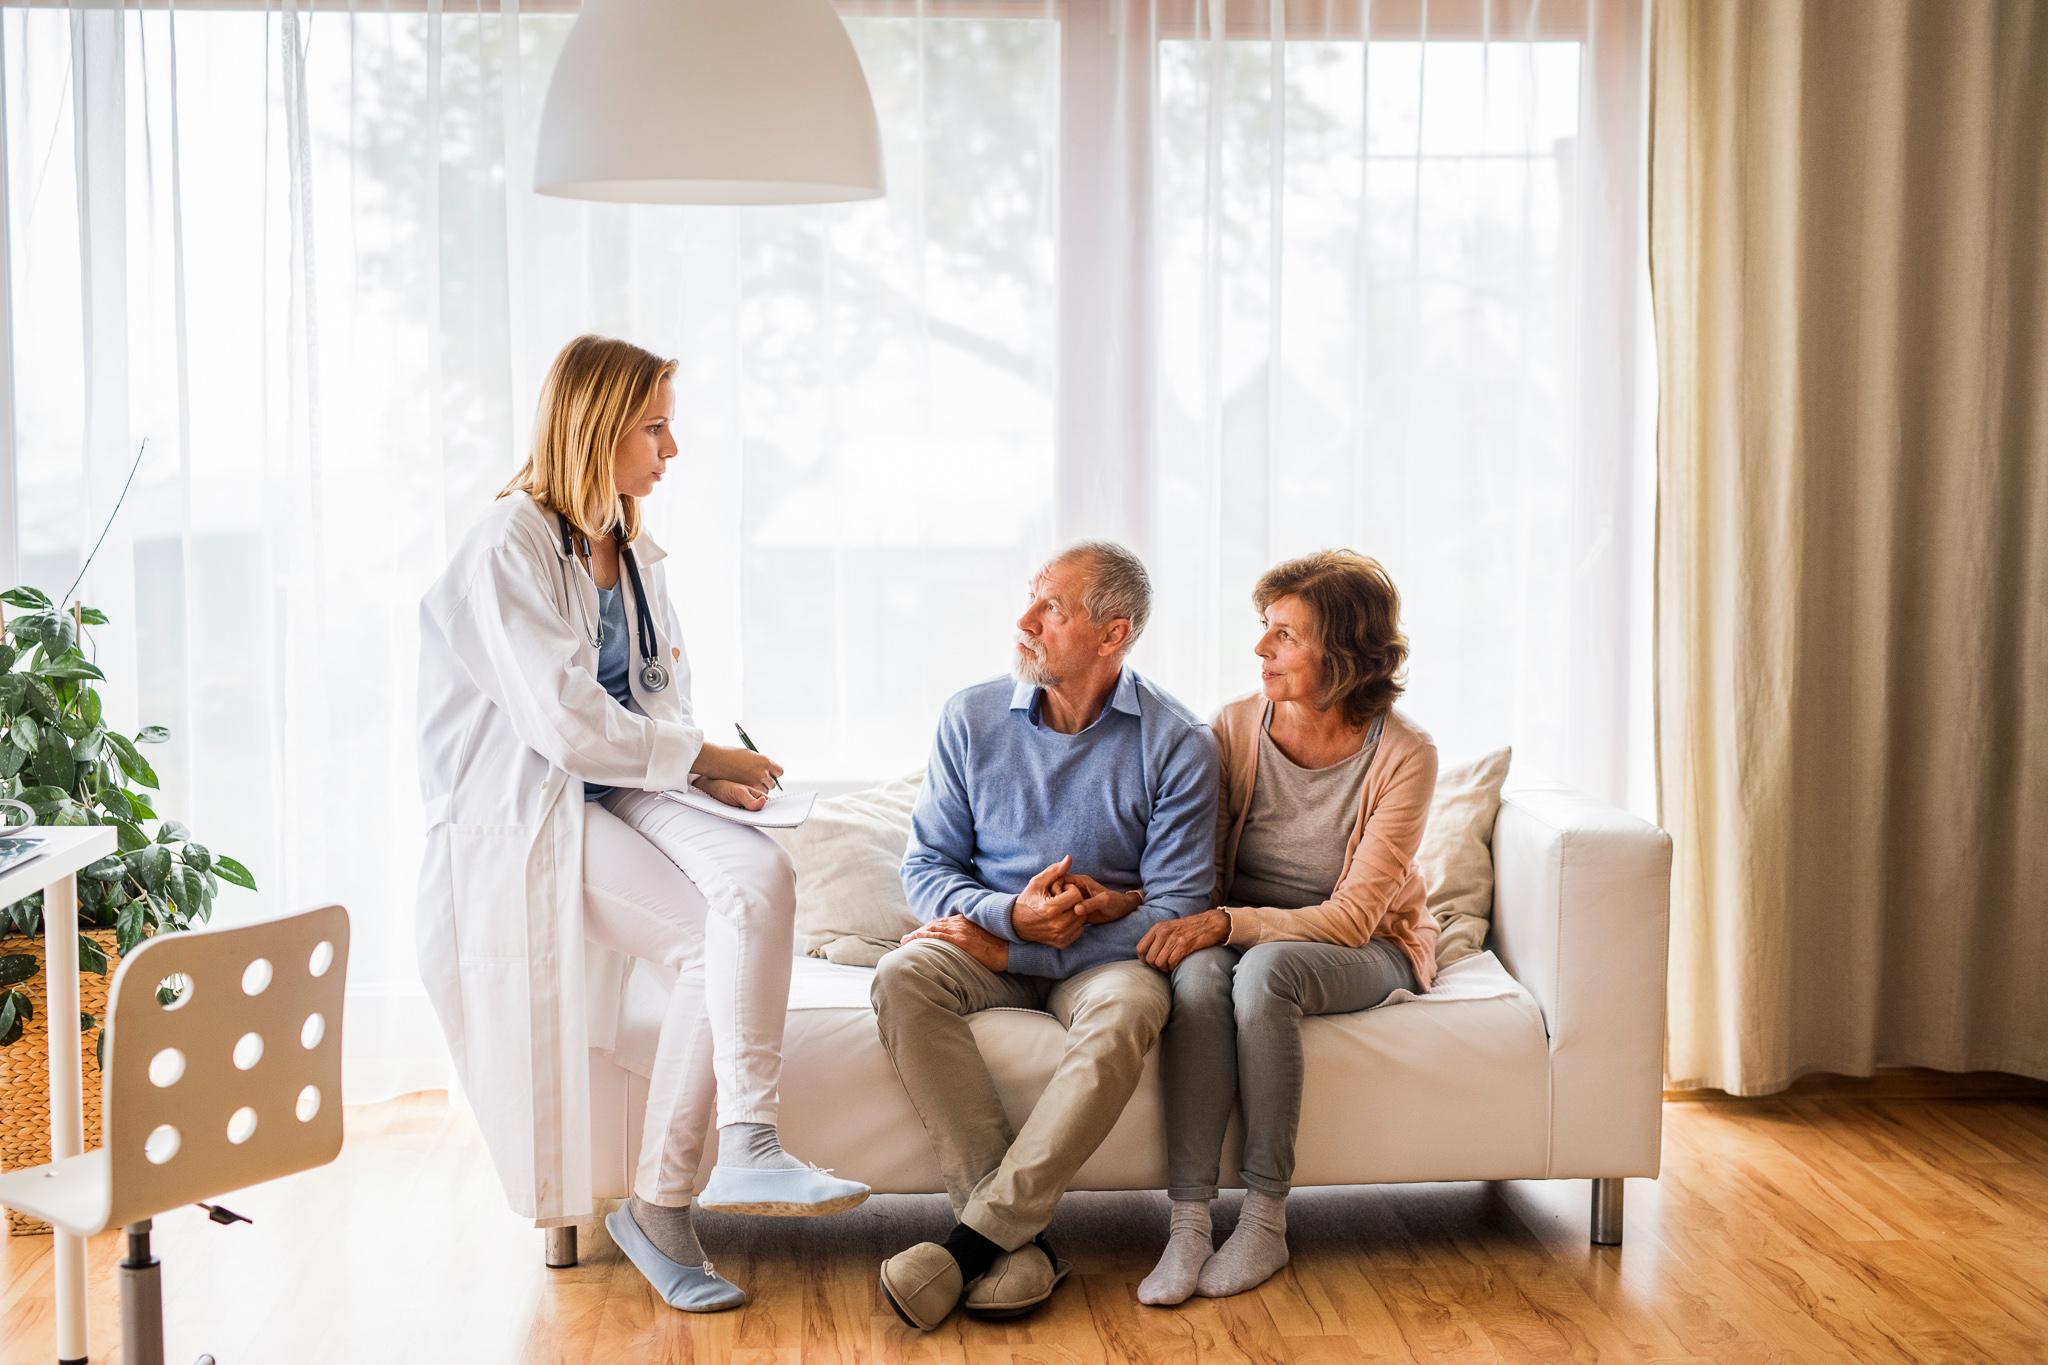 Medicina da Família e da comunidade